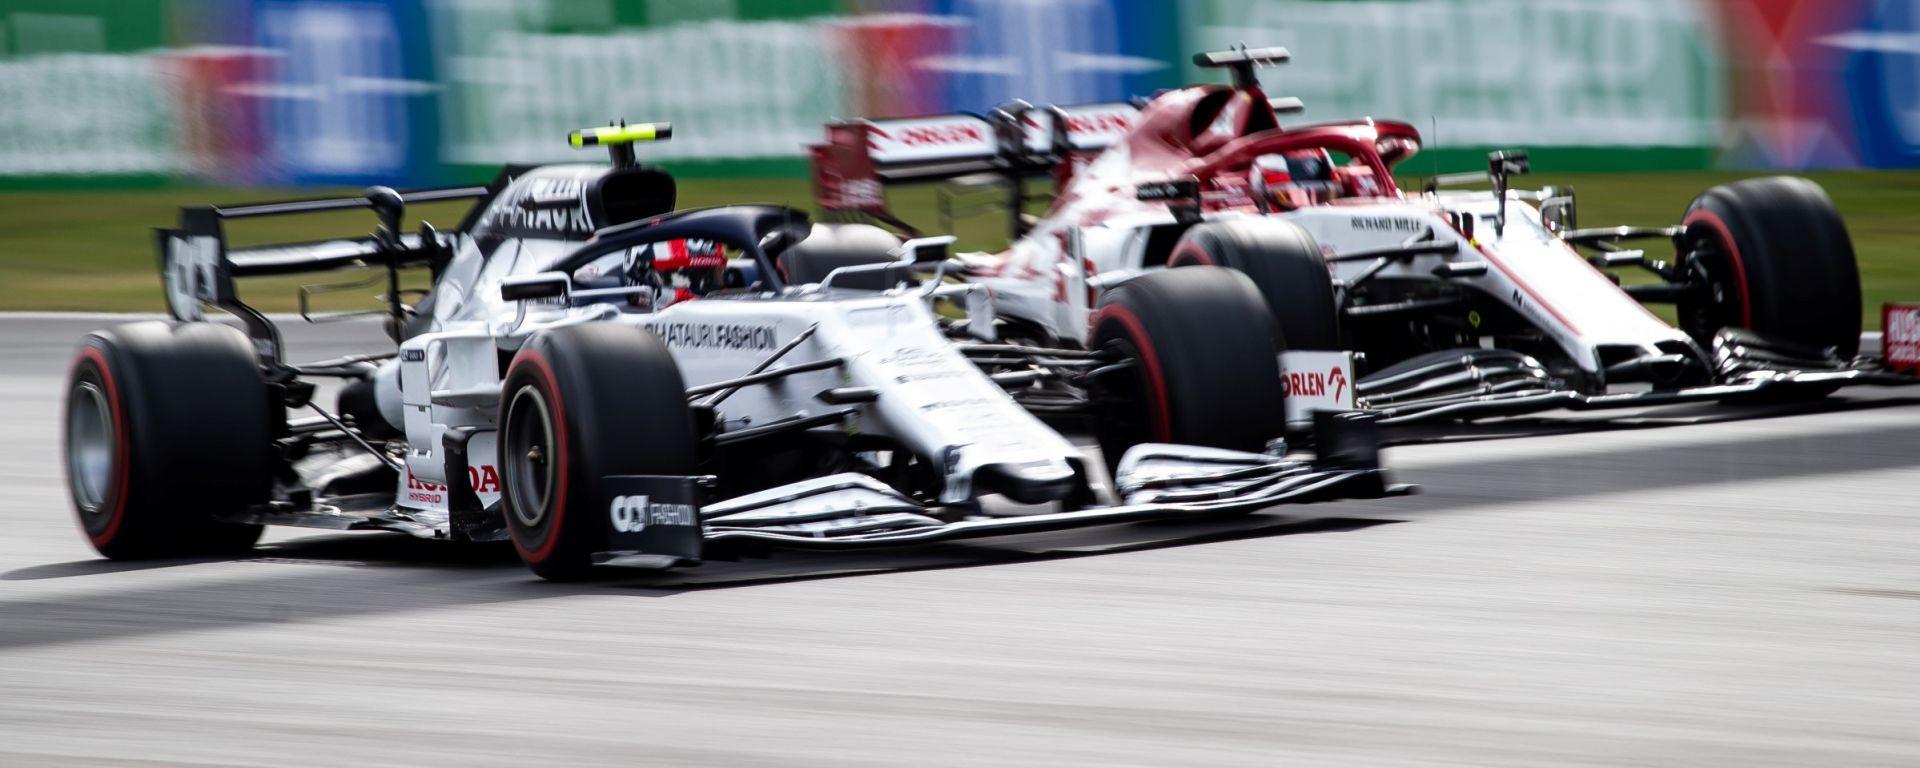 F1, GP Portogallo 2020: Kimi Raikkonen (Alfa Romeo) e Pierre Gasly (AlphaTauri)